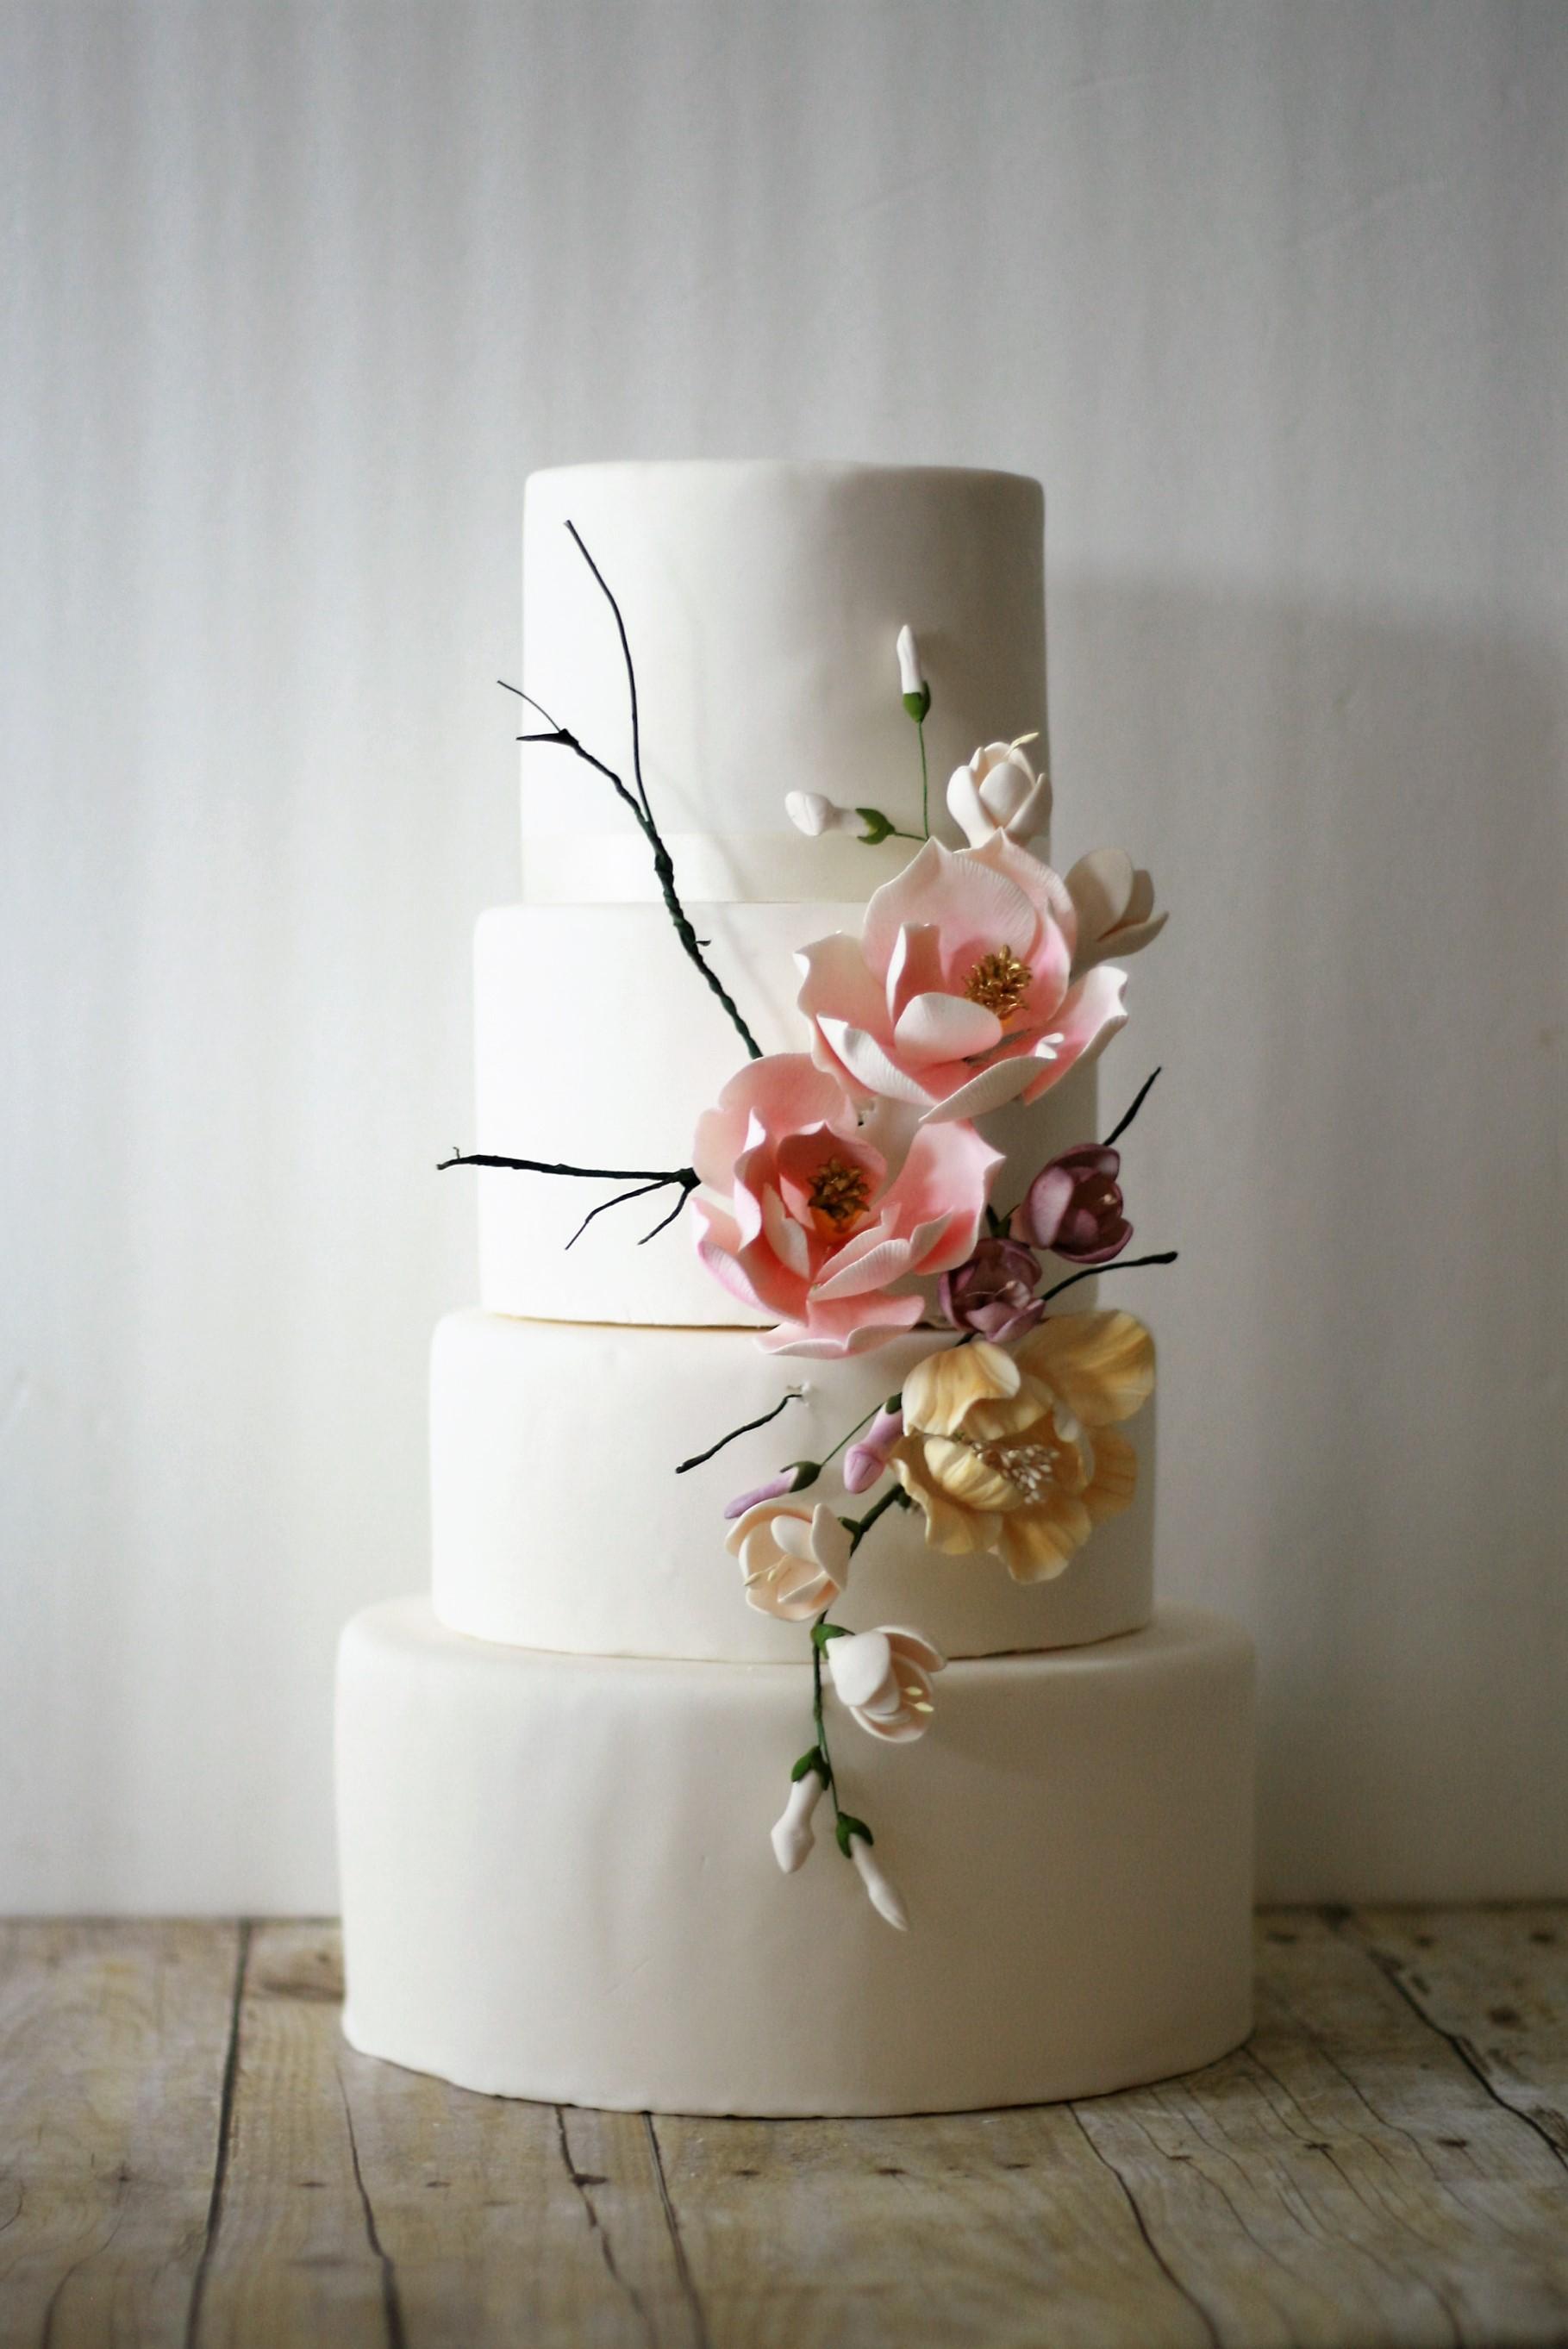 White wedding cake with sugar roses